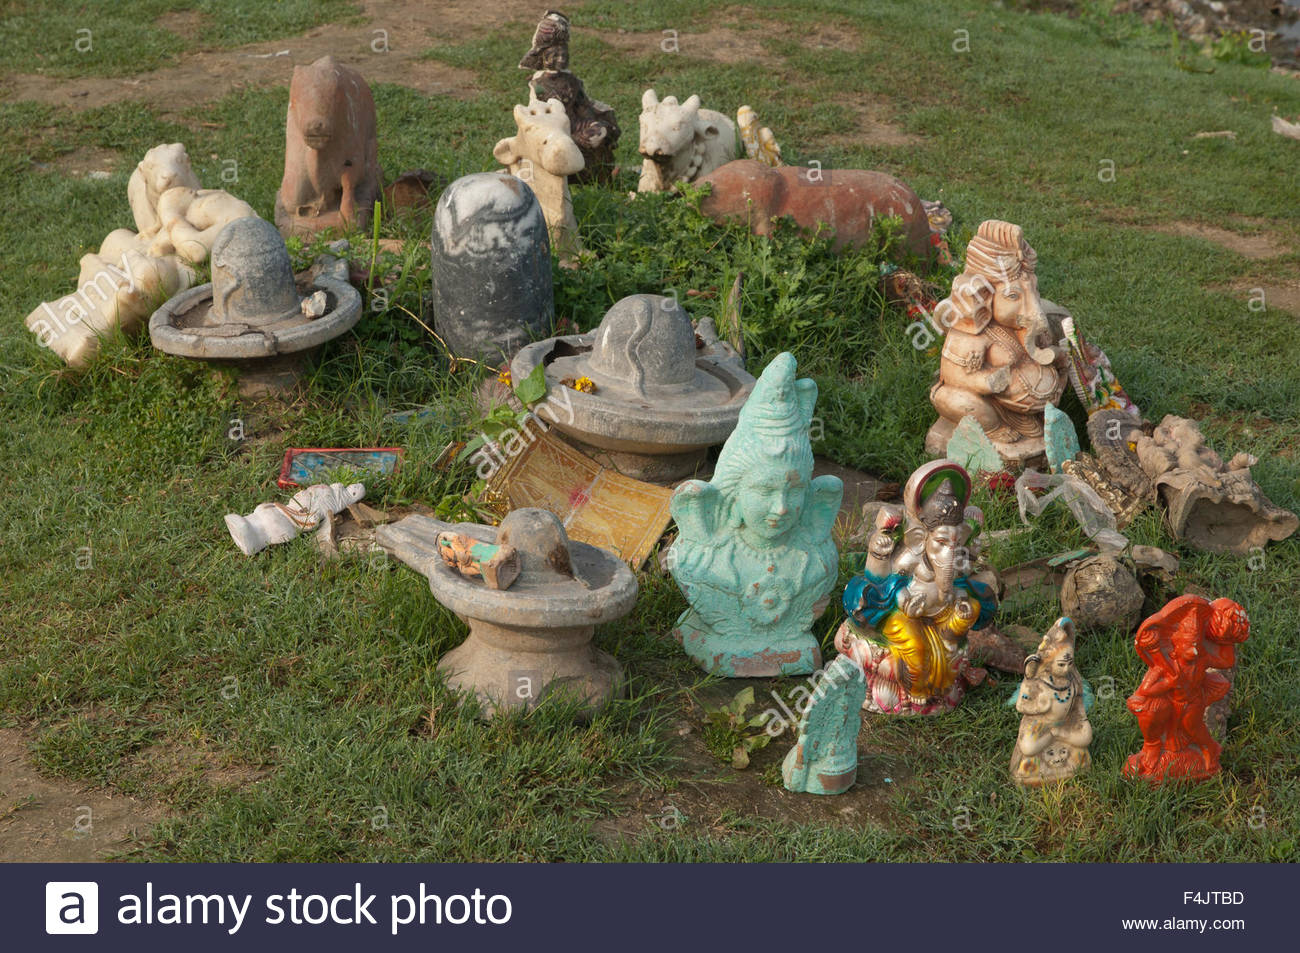 Religious figures representing to Hindu deities. Yamuna river. Agra. Uttar Pradesh. India. - Stock Image